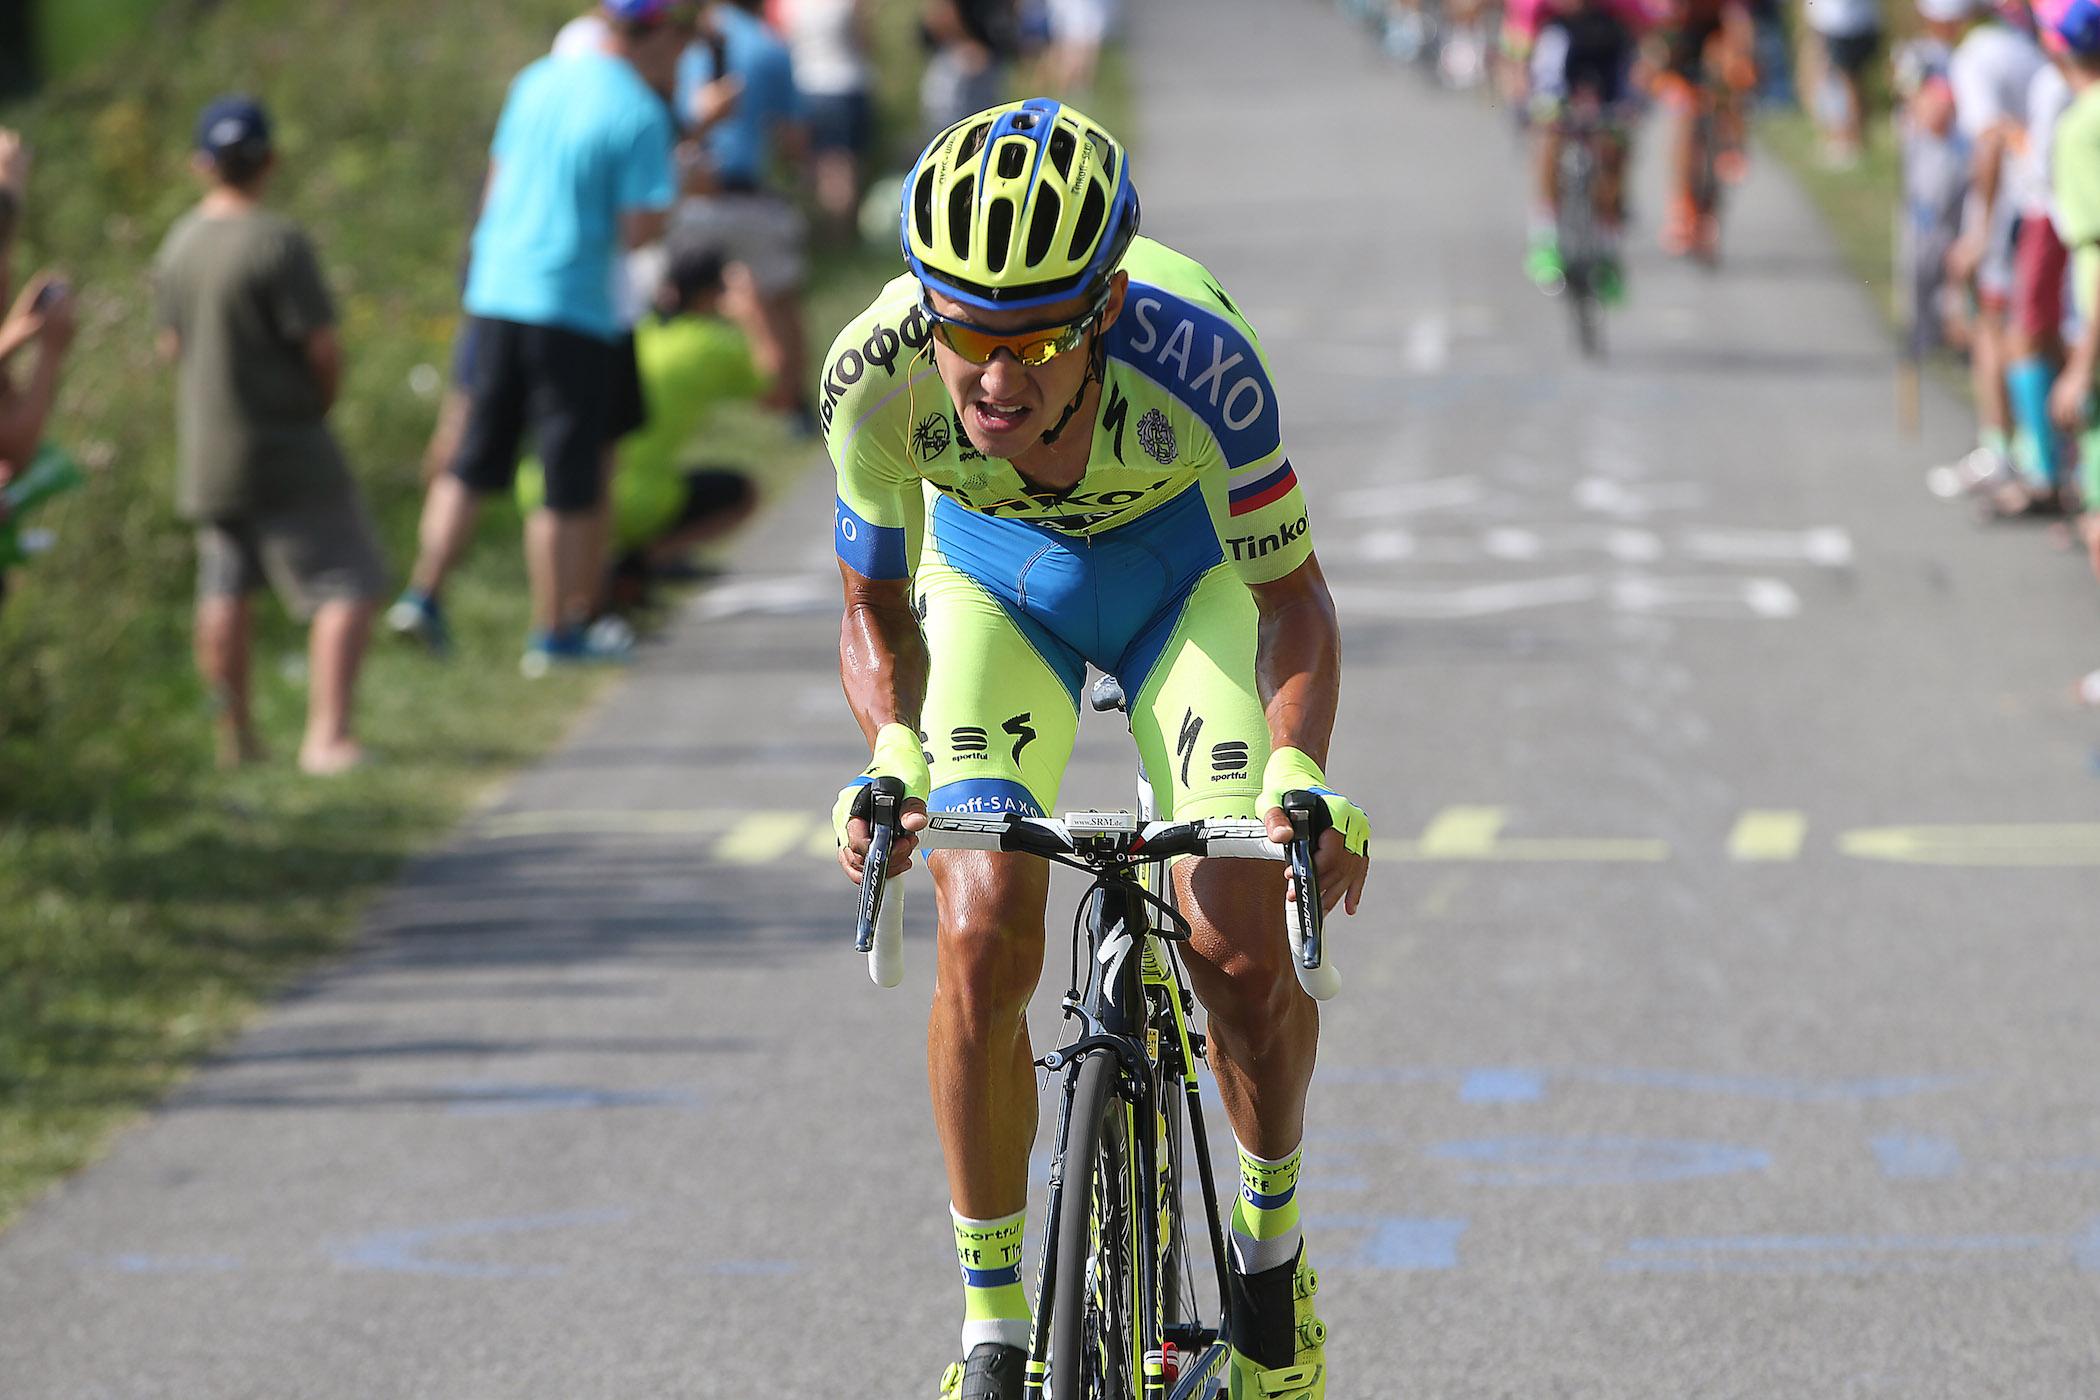 Tour de Pologne 2015 - 6a tappa Bukowina Terma Hotel Spa - Bukowina Tatrzanska 174 km - 07/08/2015 - Pawel Poljanski (Tinkoff - Saxo) - foto Ilario Biondi/BettiniPhoto©2015